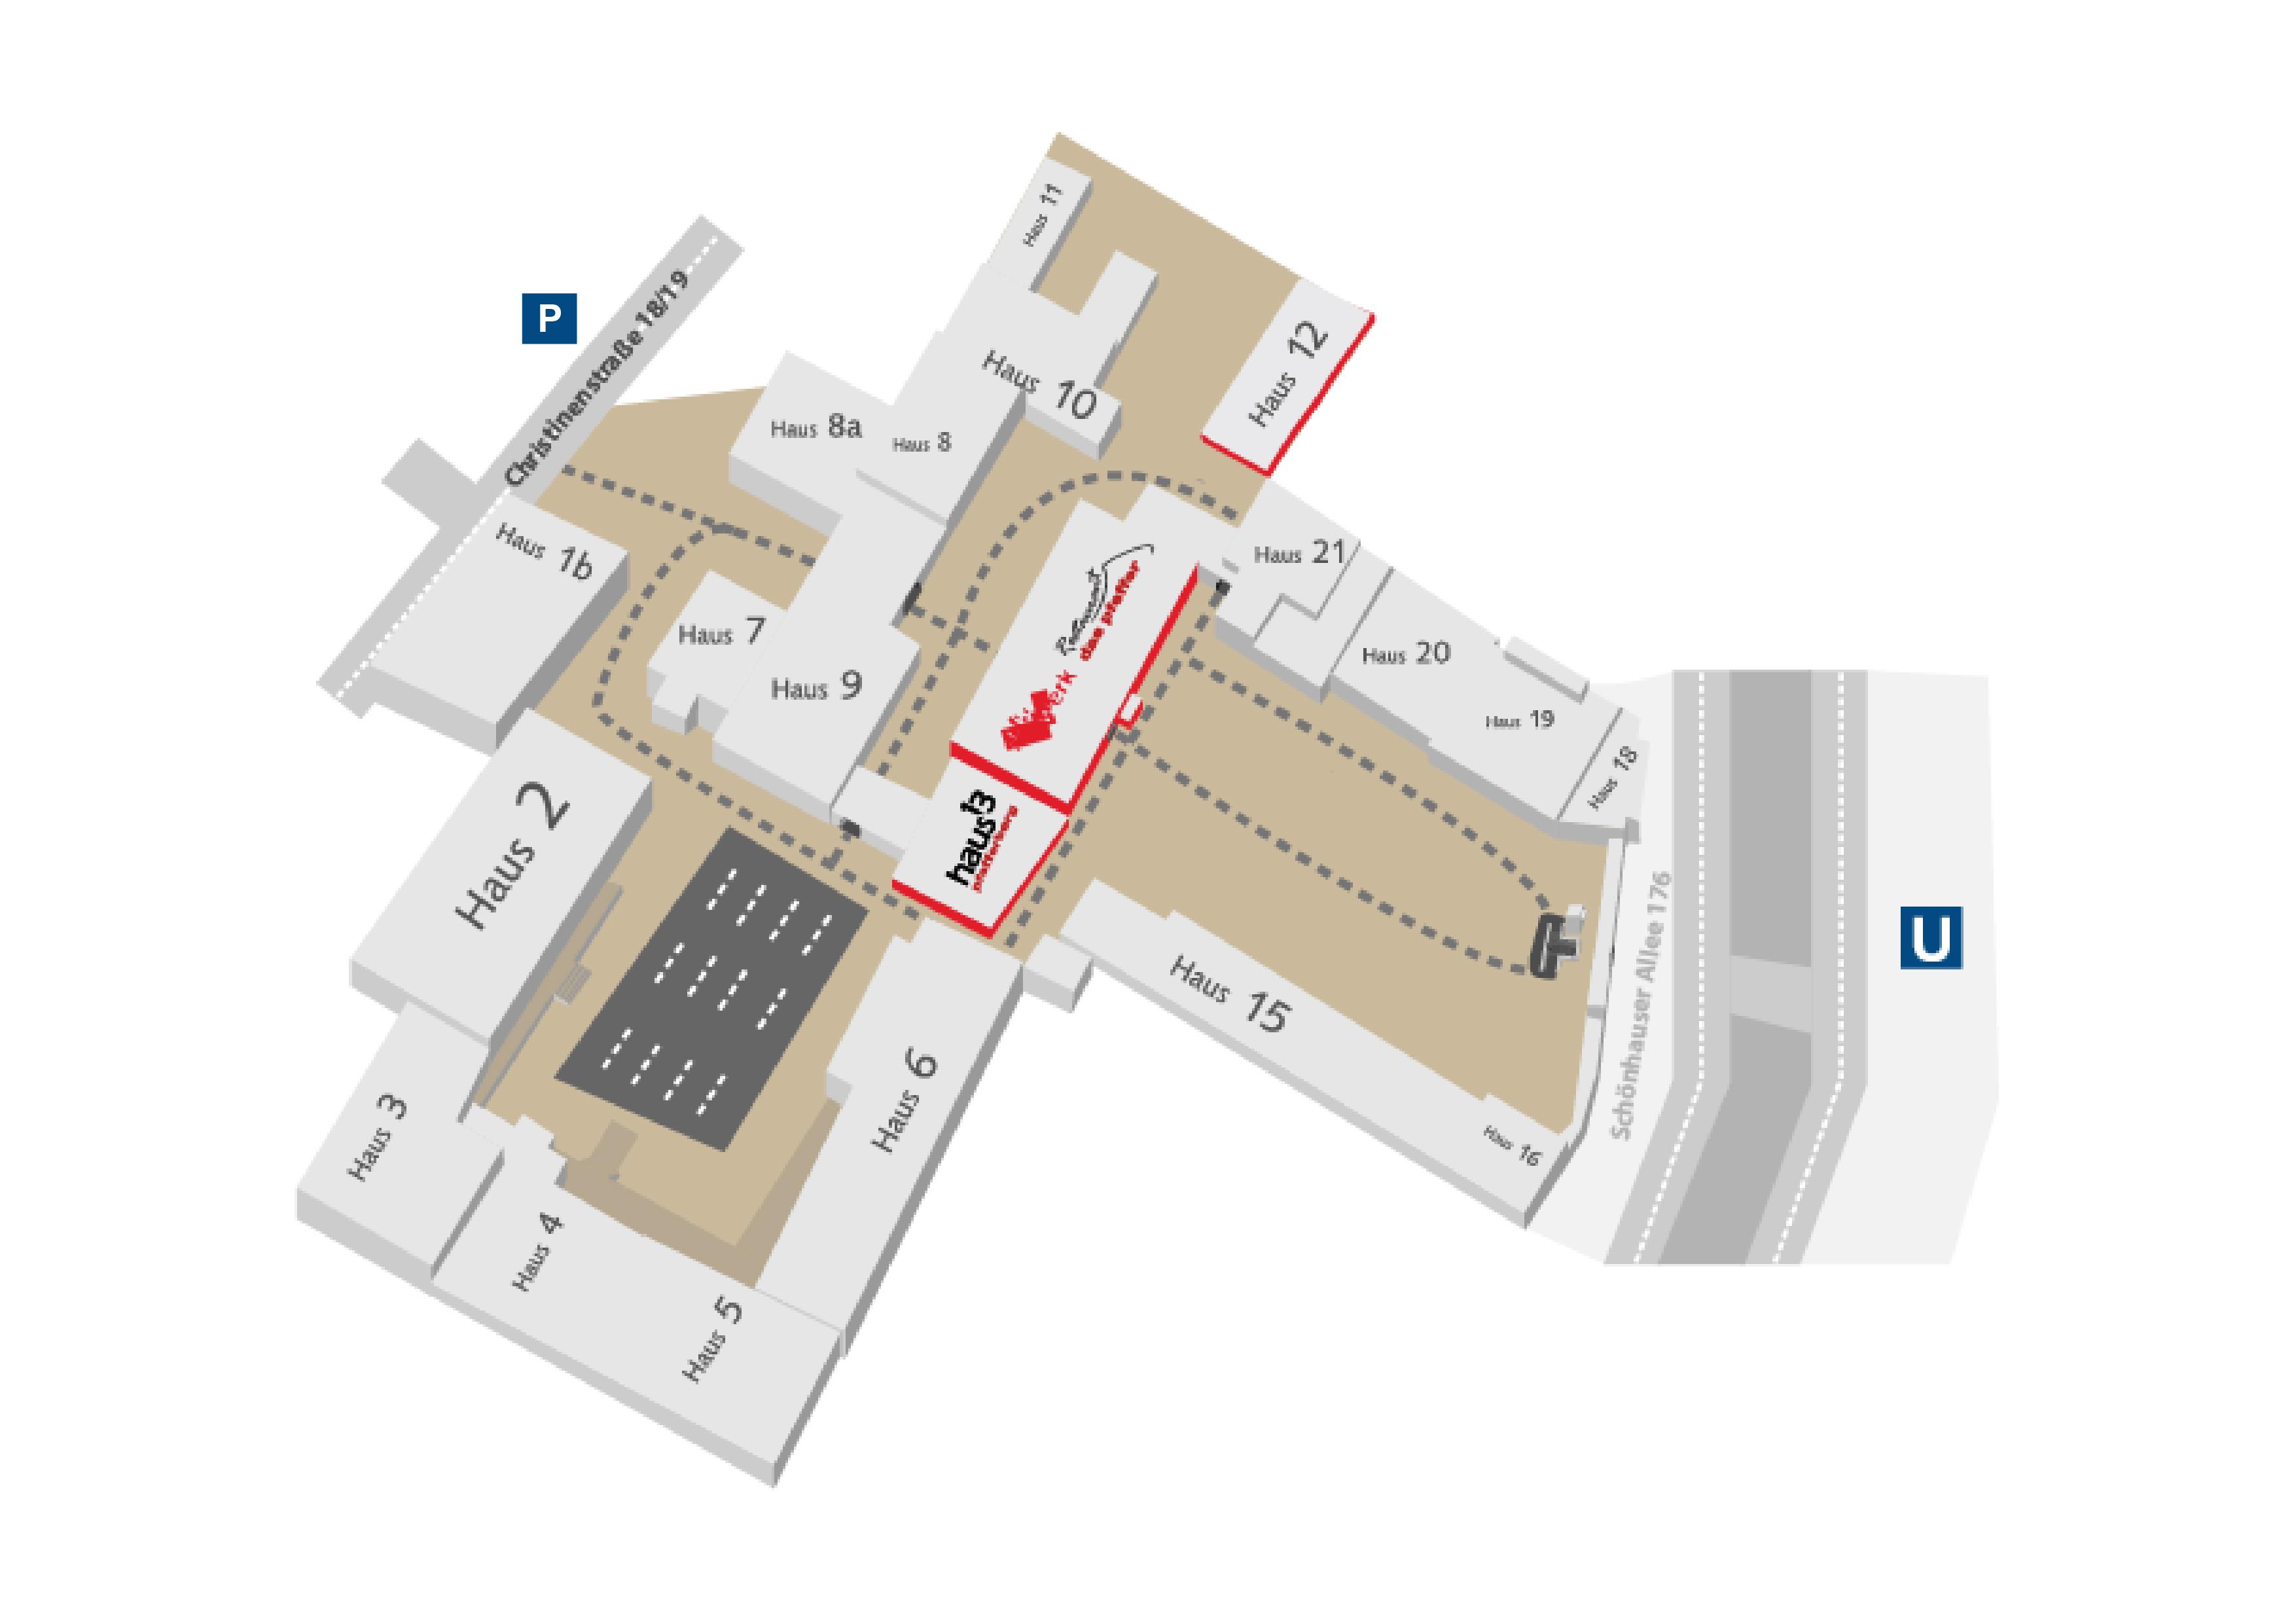 location map - Behandlungsvertrag Muster